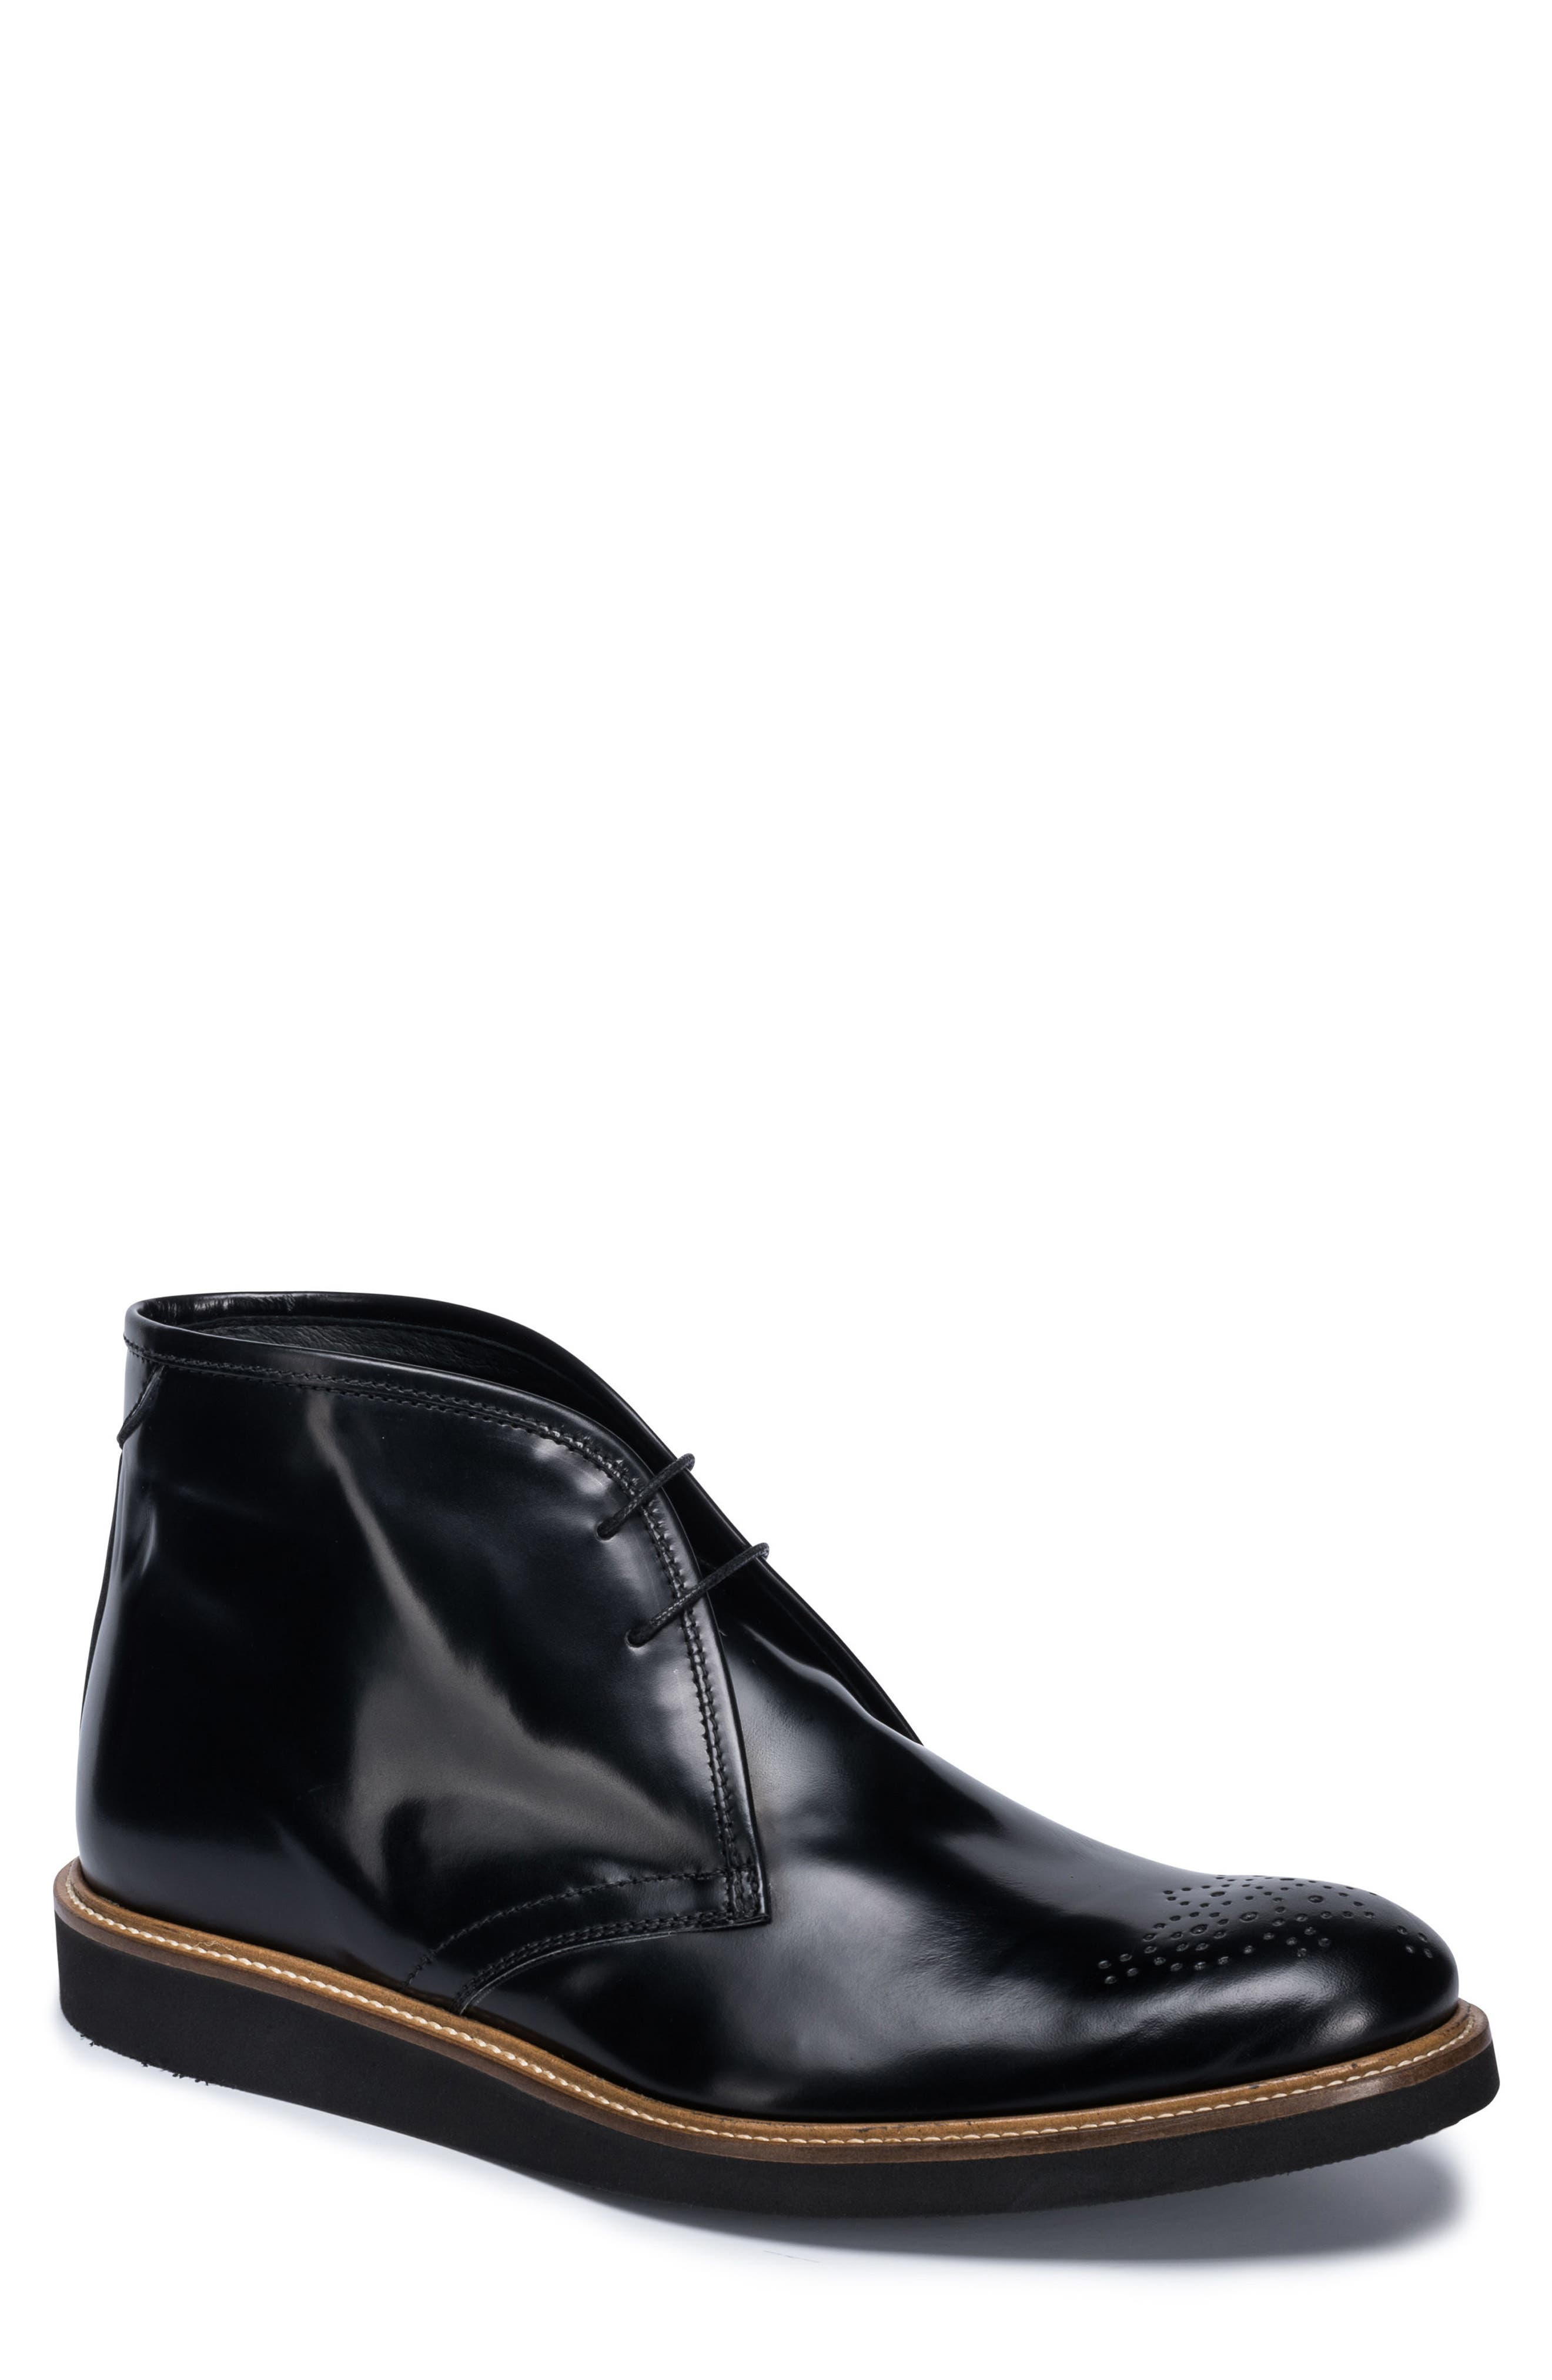 Verona Brogued Chukka Boot,                         Main,                         color, Nero